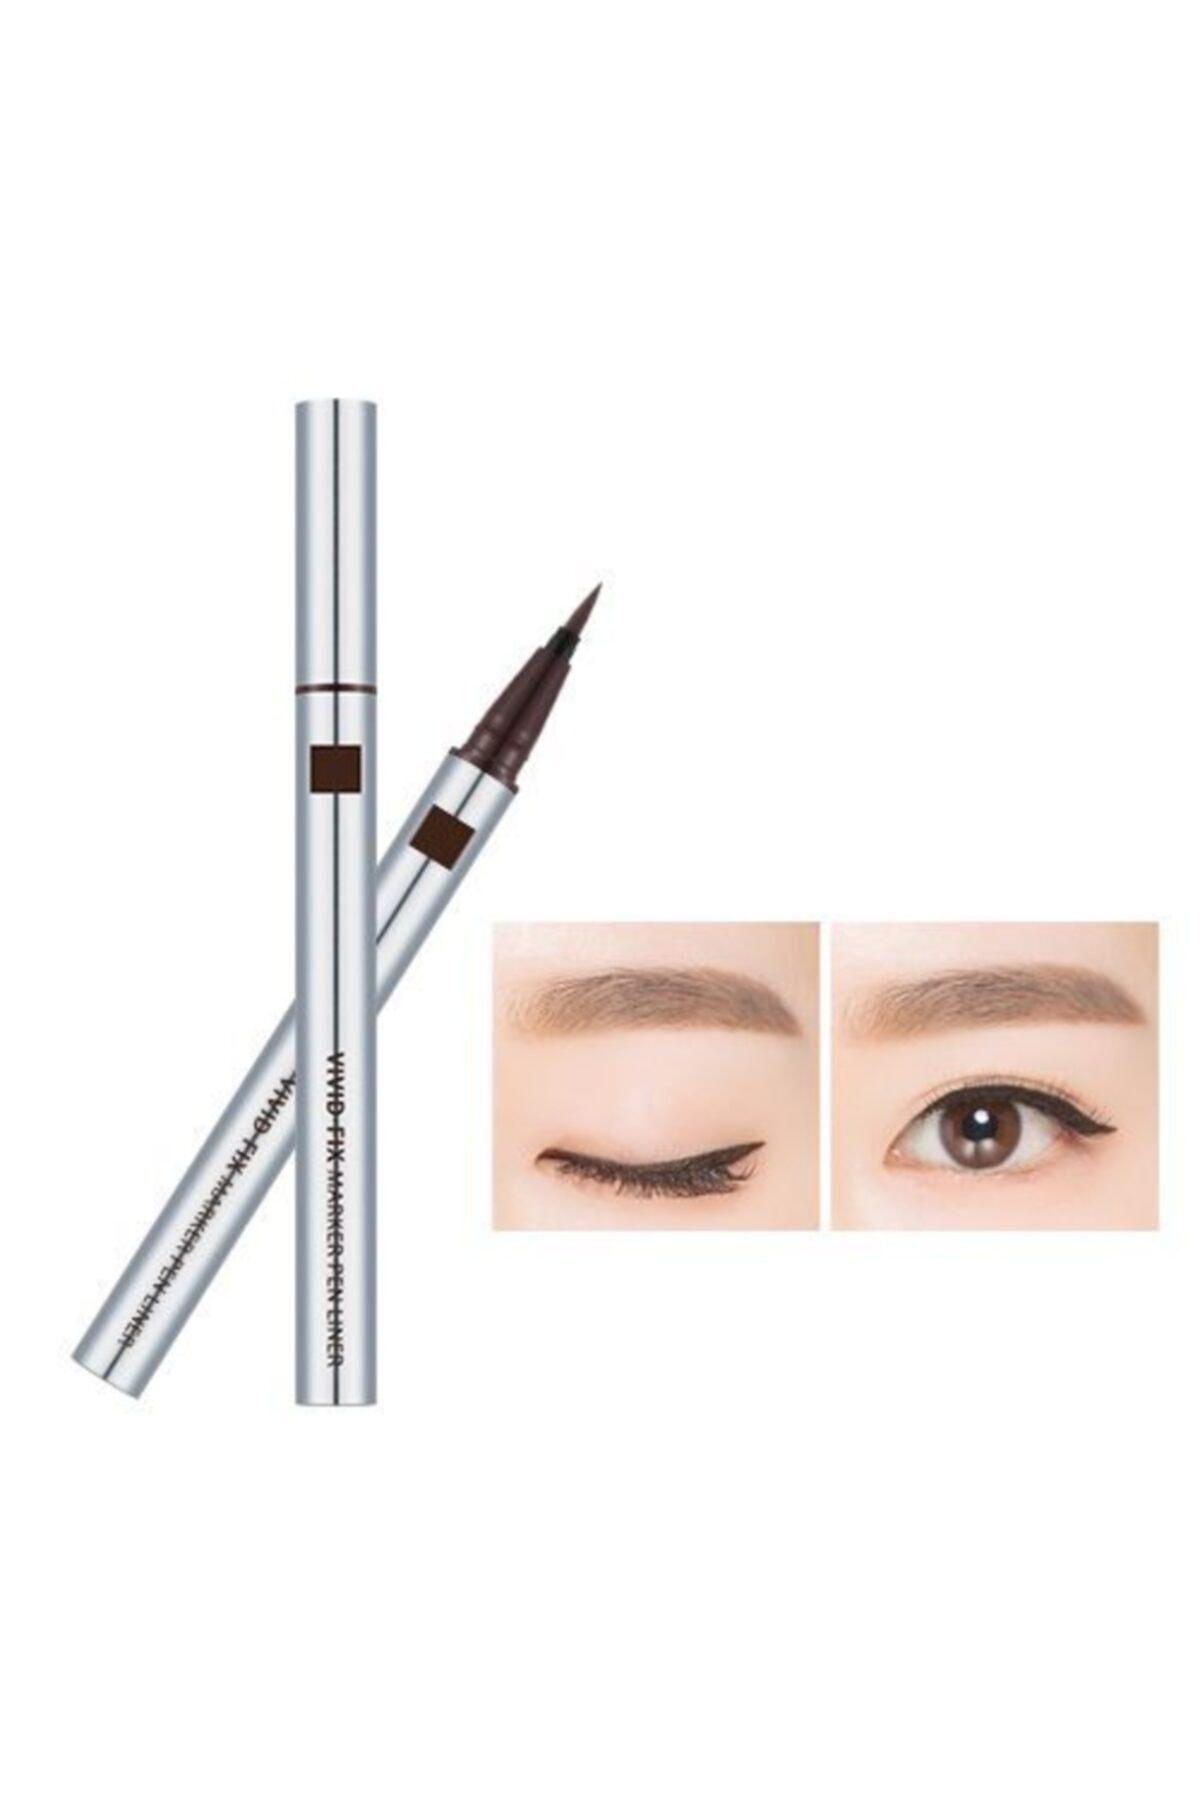 Missha Kadife Bitişli Kalem Liner - Vivid Fix Marker Pen Liner (Deep Brown) 0.6g 8806185798020 1